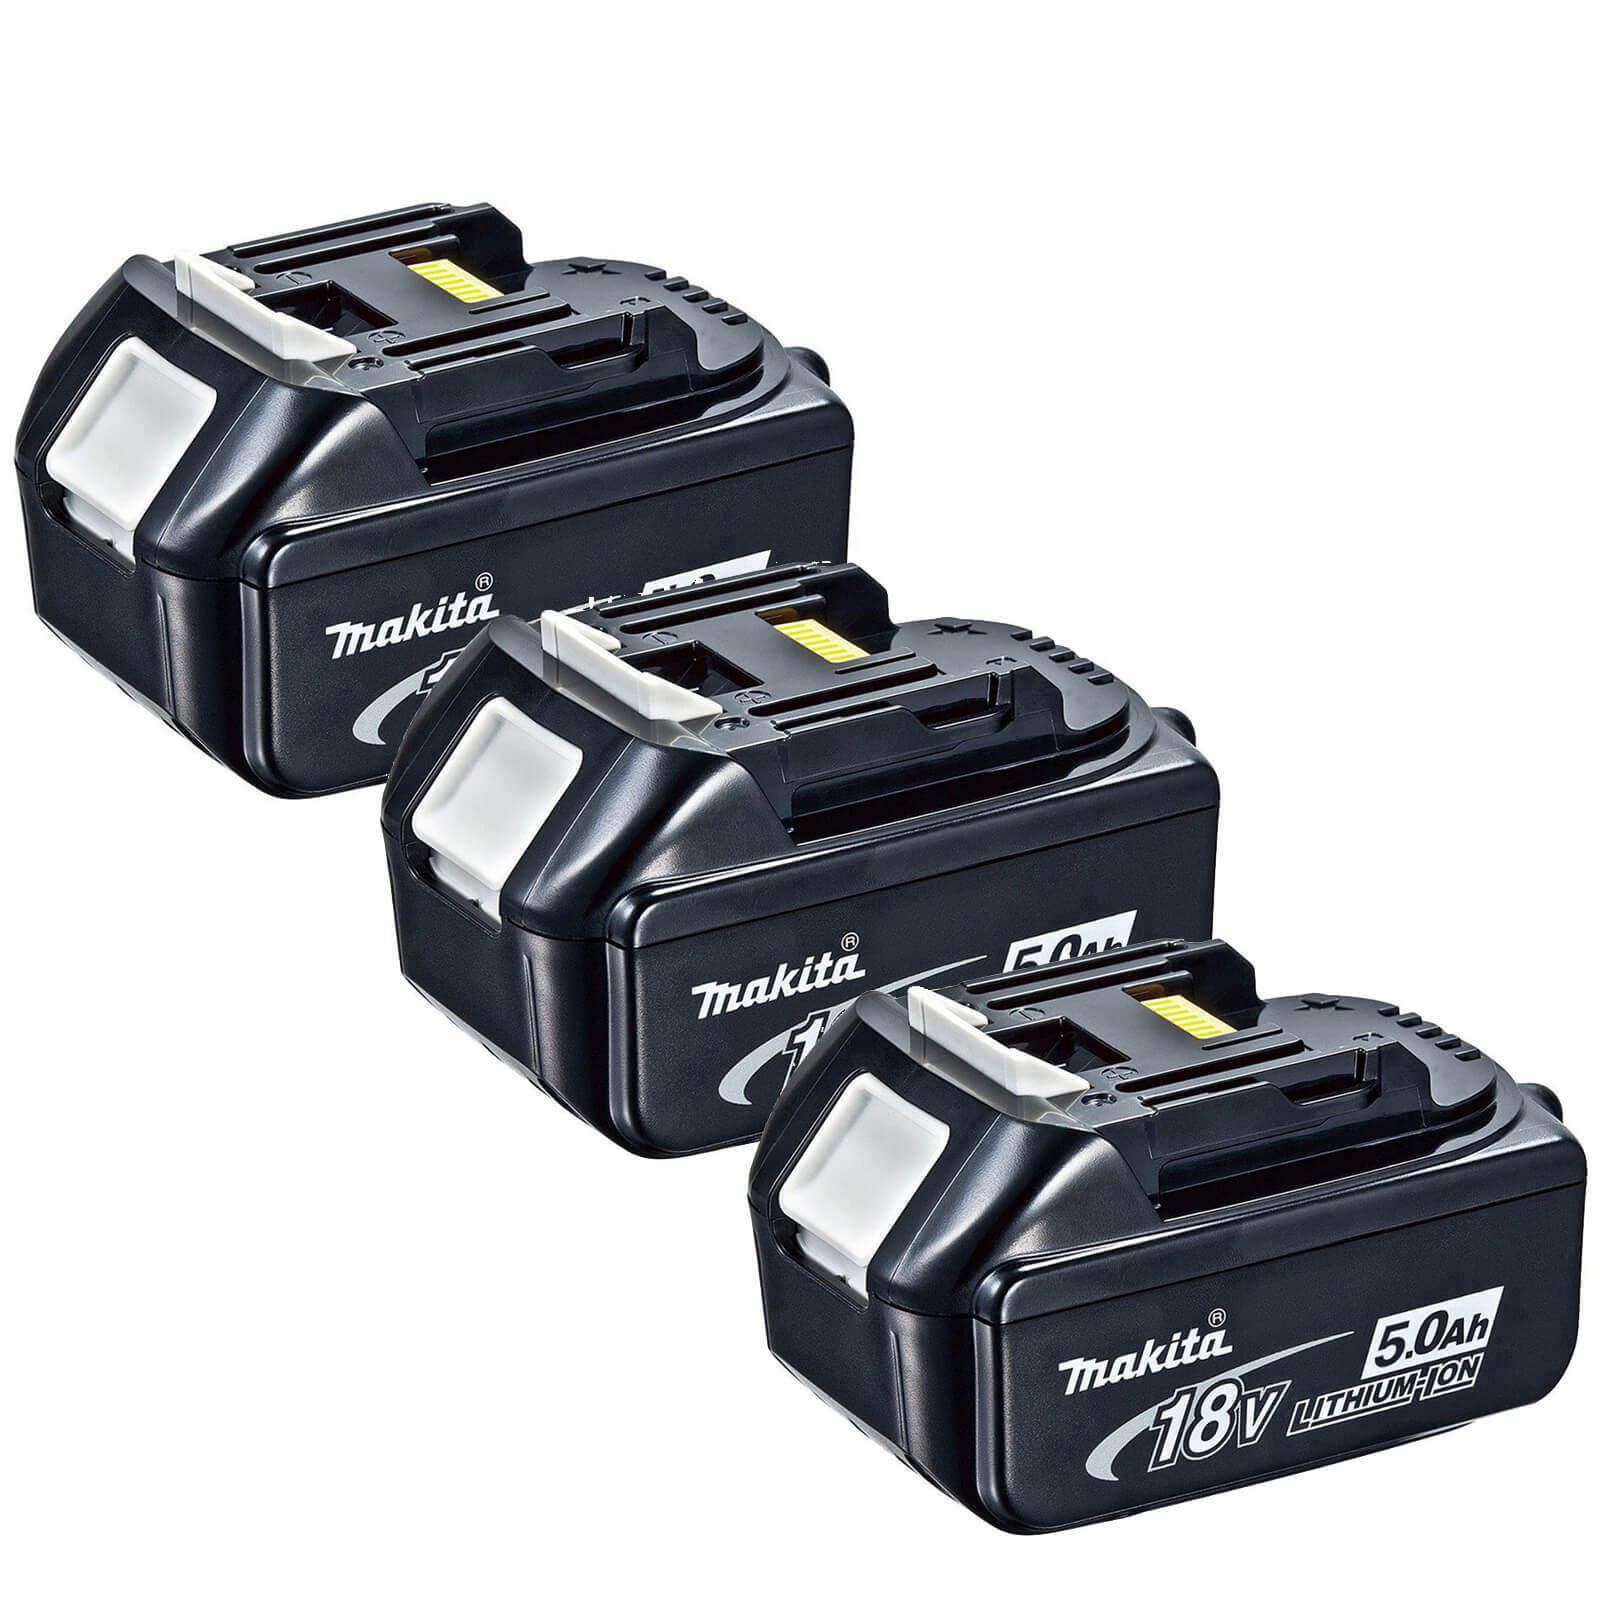 Image of Makita BL1850B 18v Cordless Li-ion Battery 5ah Pack of 3